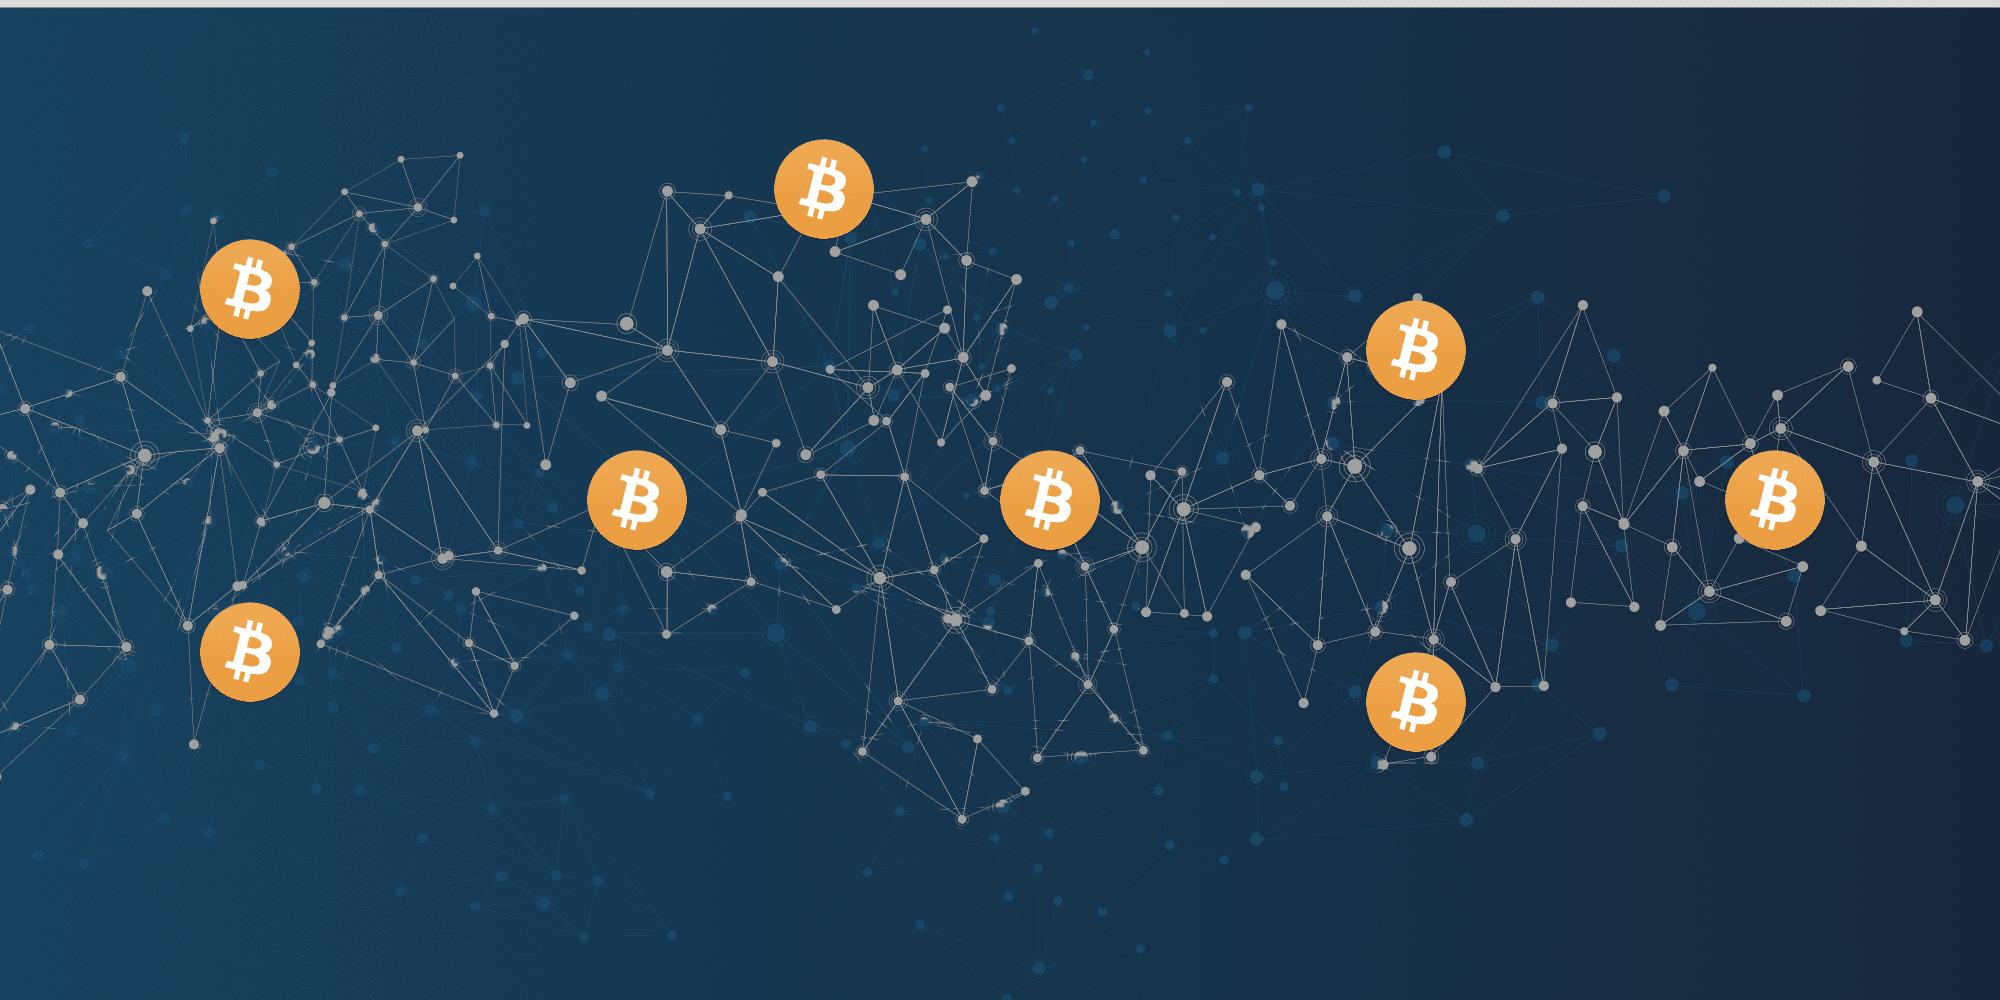 bitcoin full nodes - آلمان در نود های بیت کوین از آمریکا پیشی گرفت